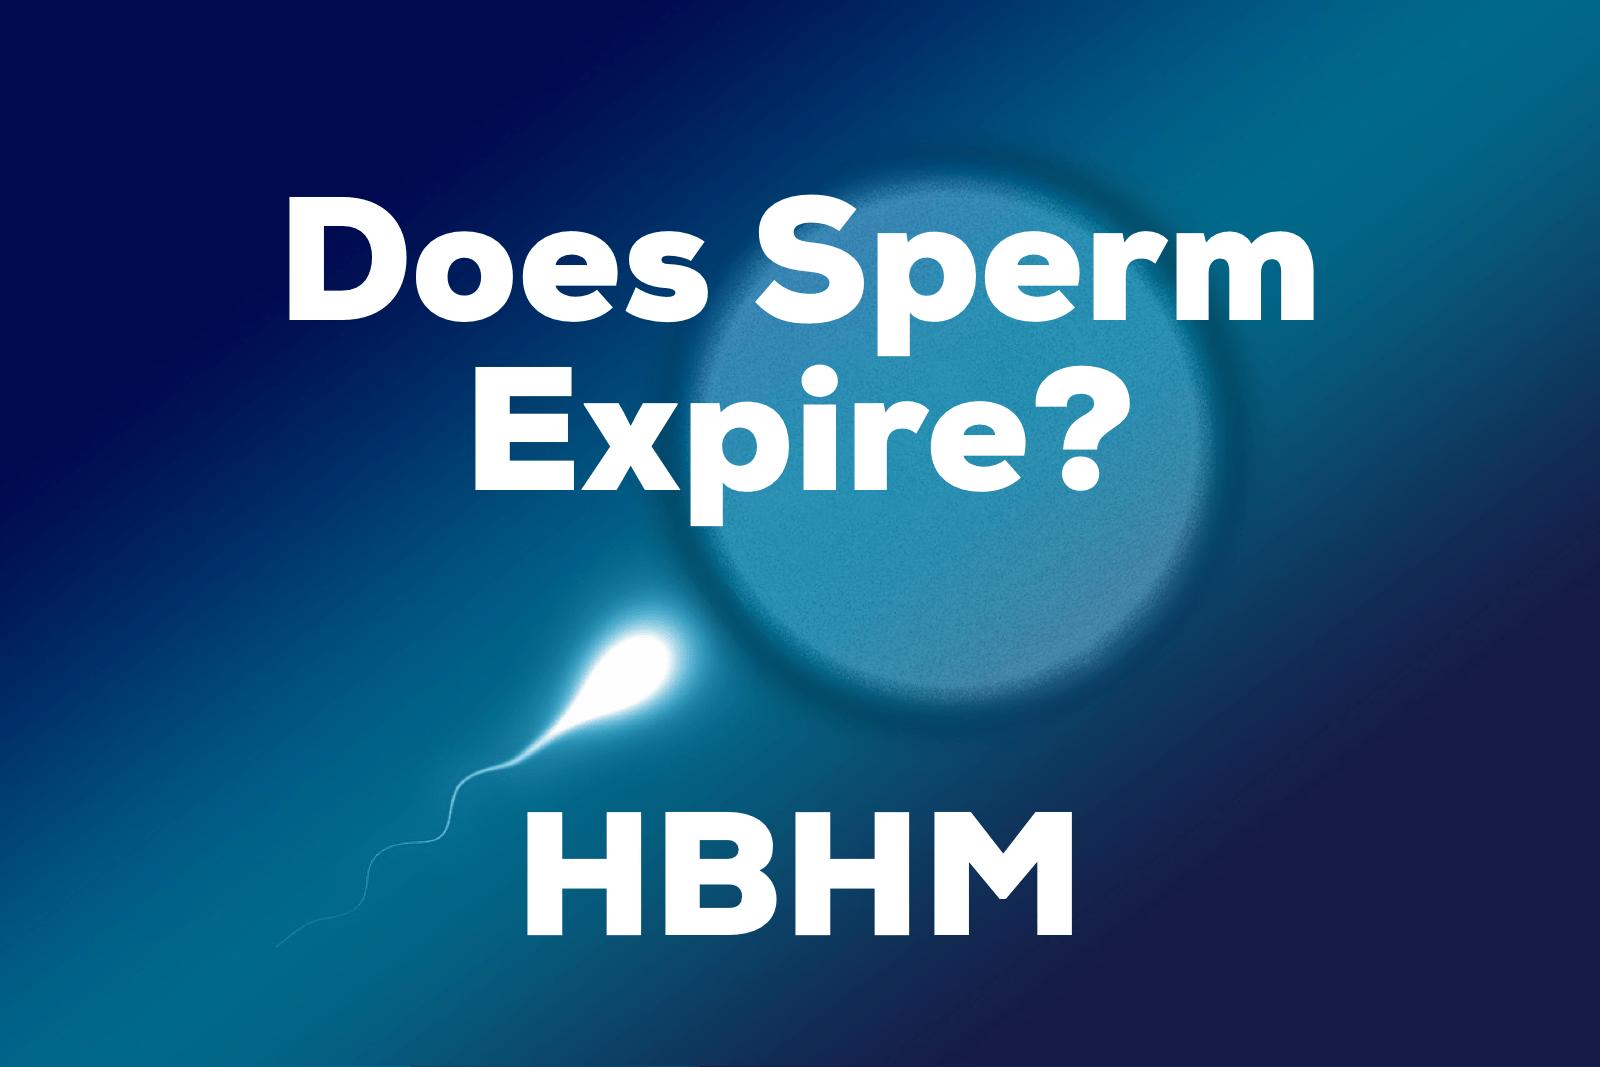 Does Sperm Expire